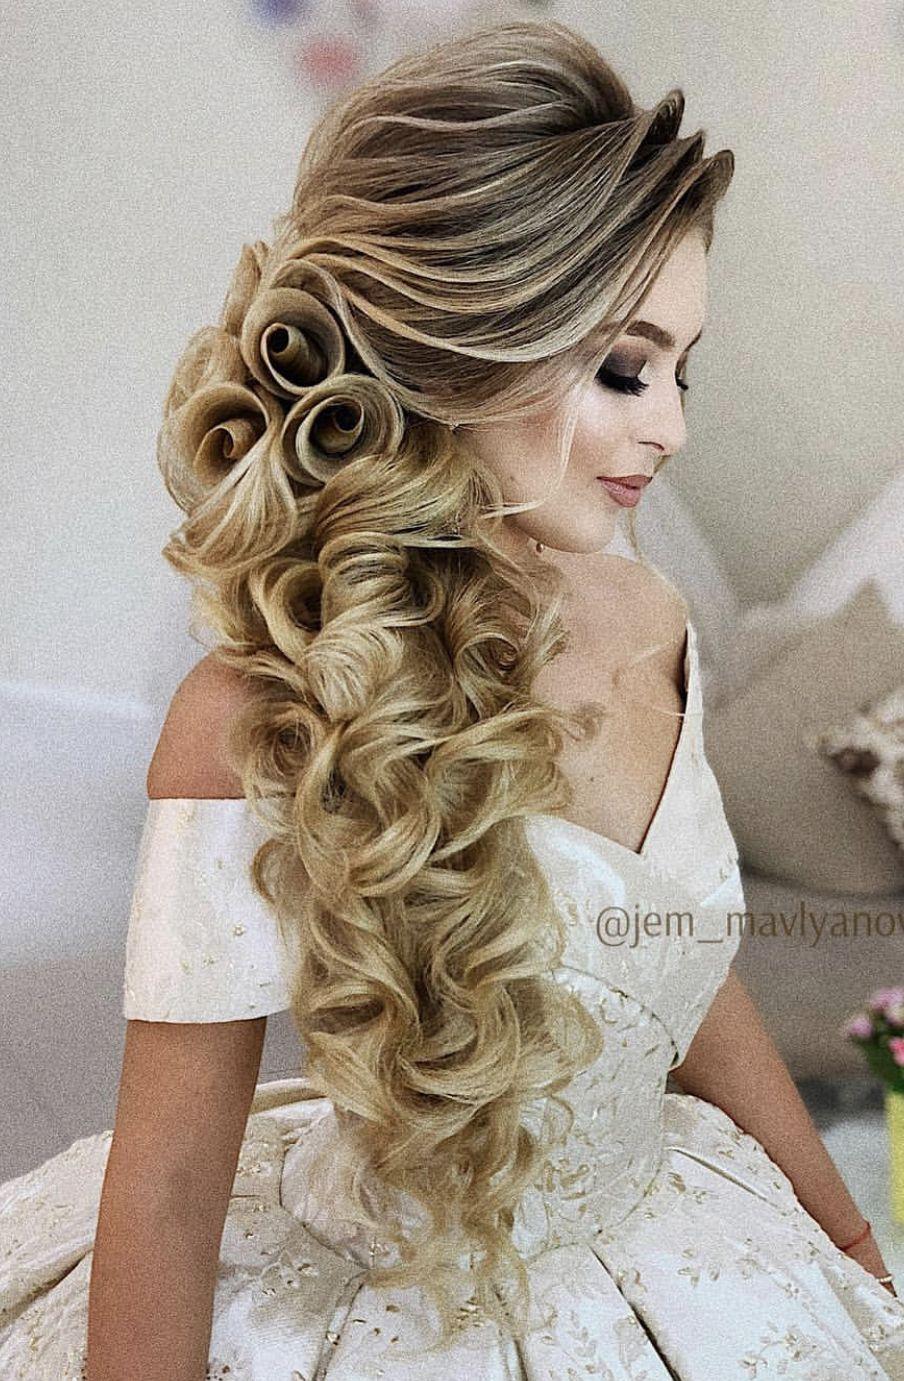 Beautiful ❤️❤️❤️ - Her Crochet  Bridal hair buns, Elegant